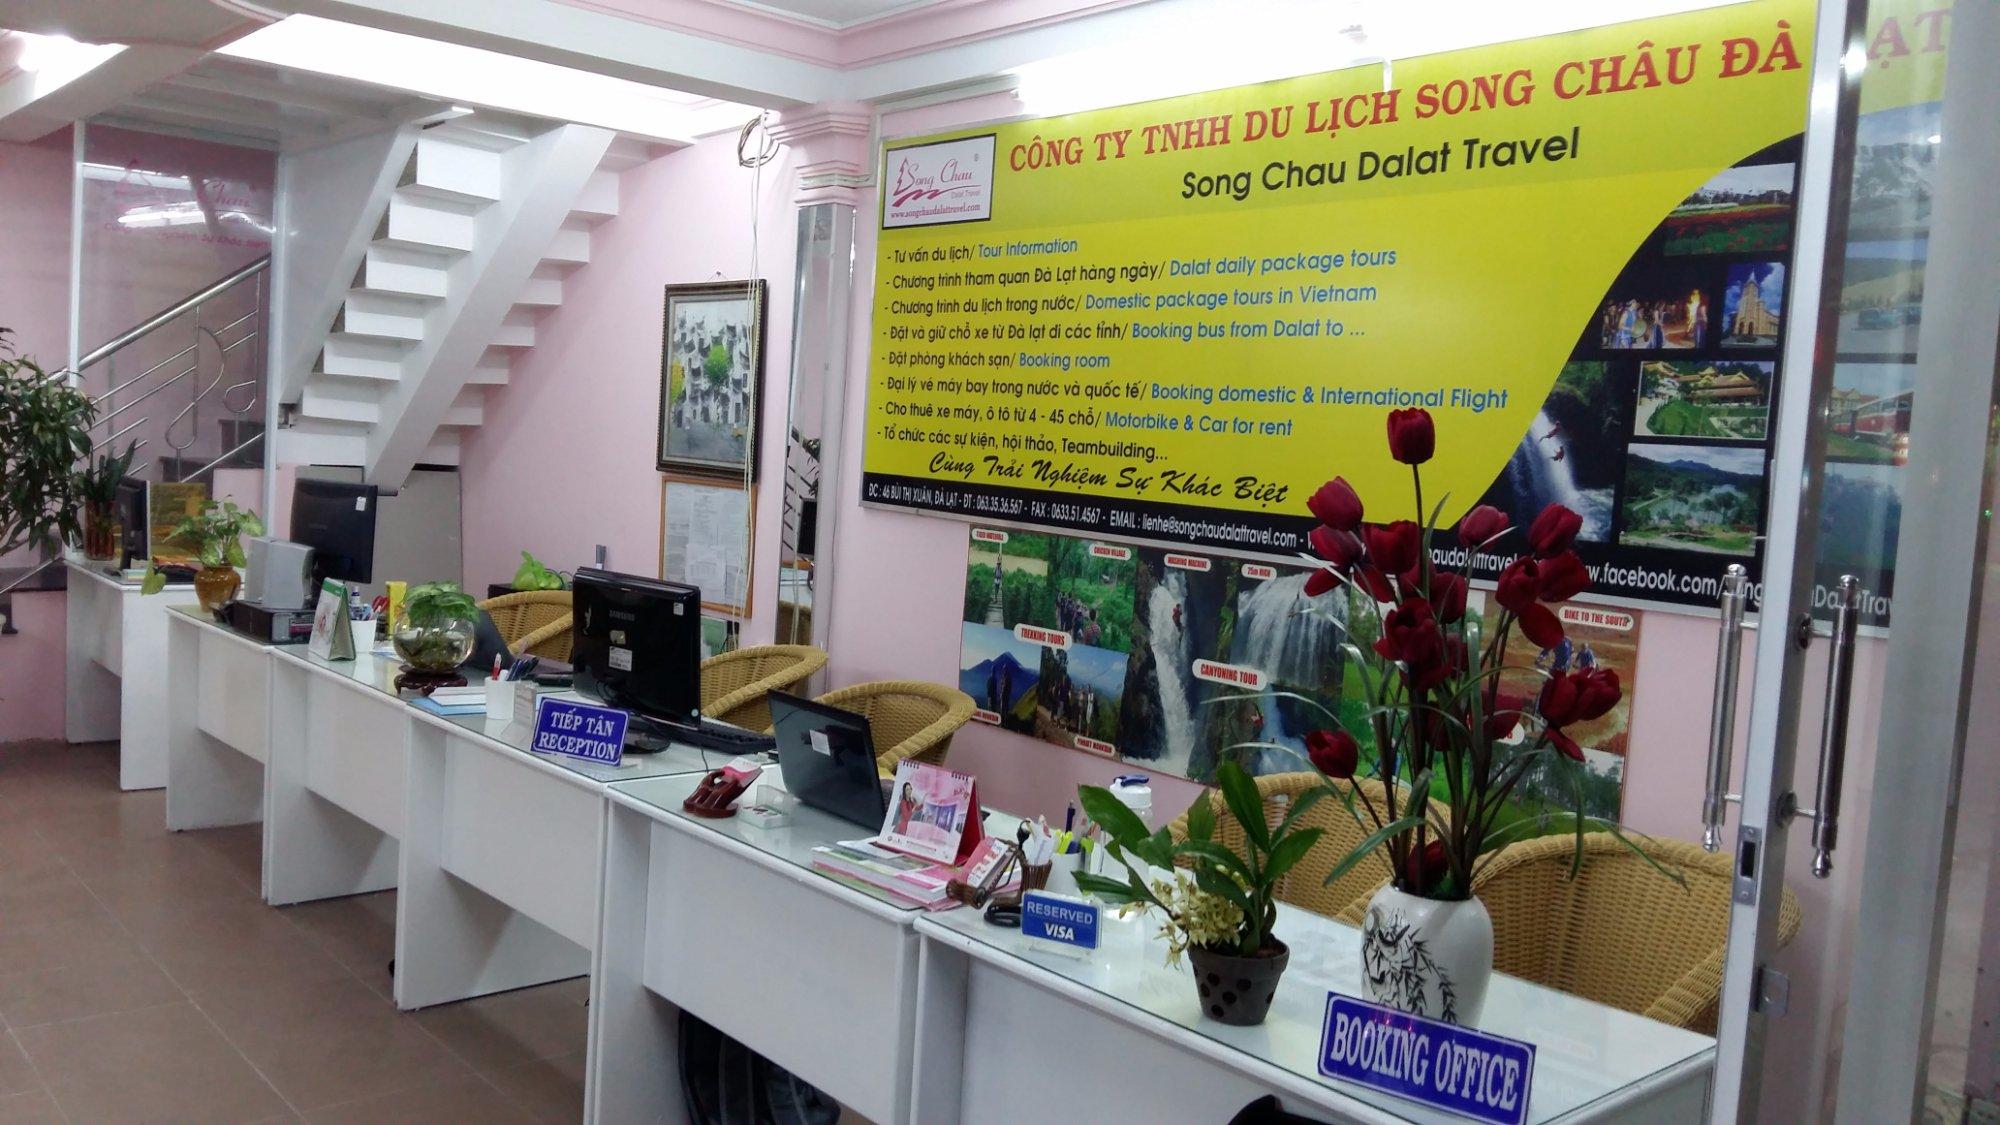 Phuong Huy 3 Dalat Guest House